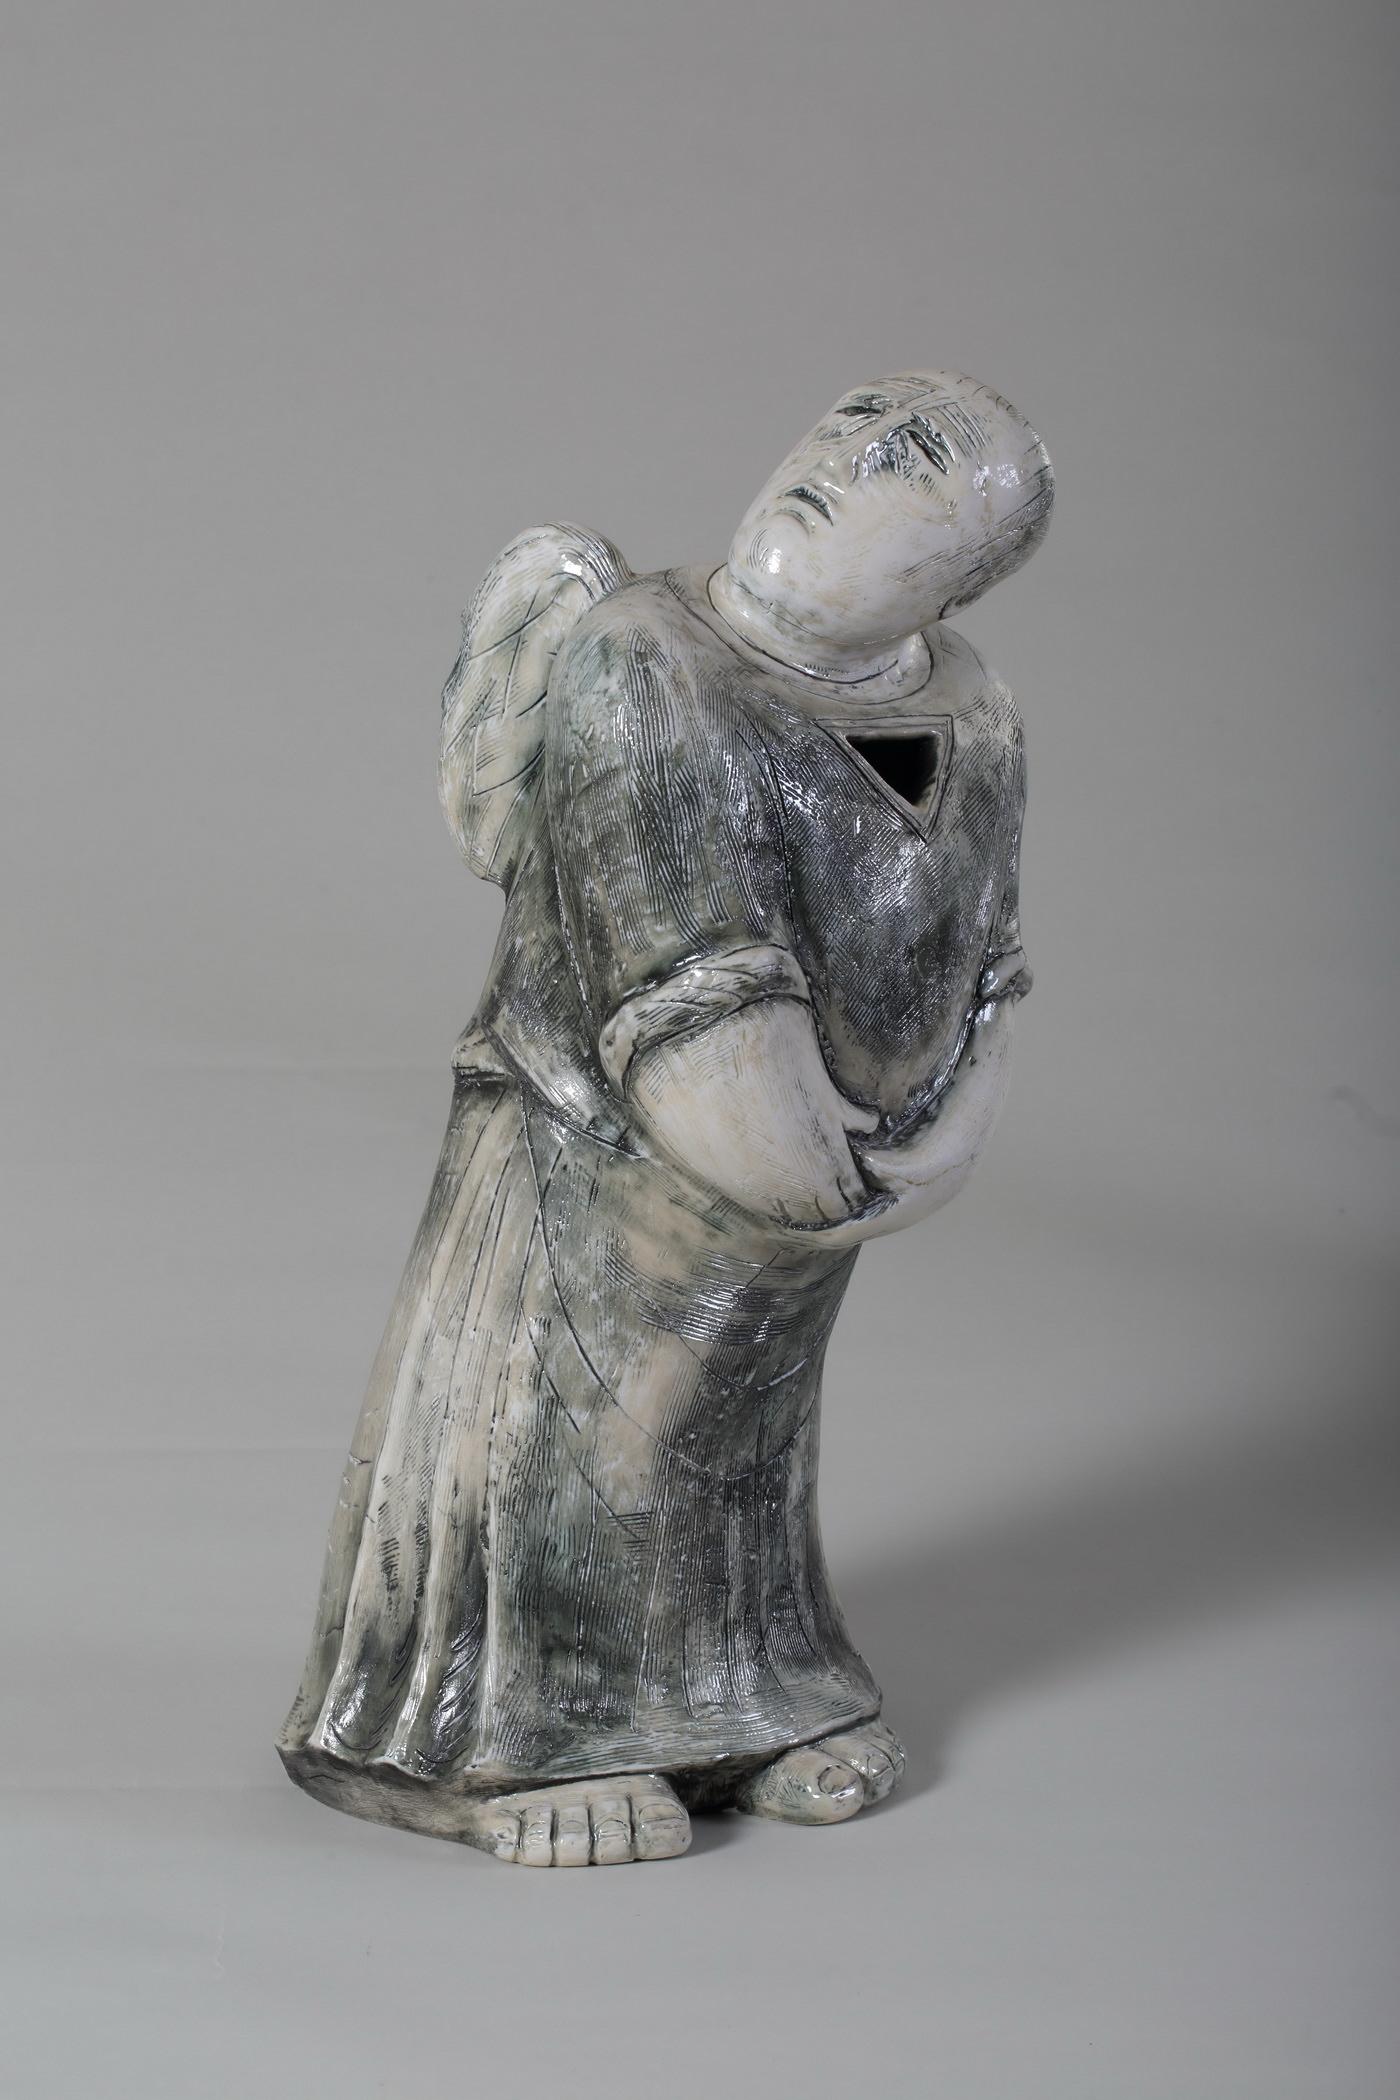 Корчемкина Н.А. Скульптура. «Ожидающий»